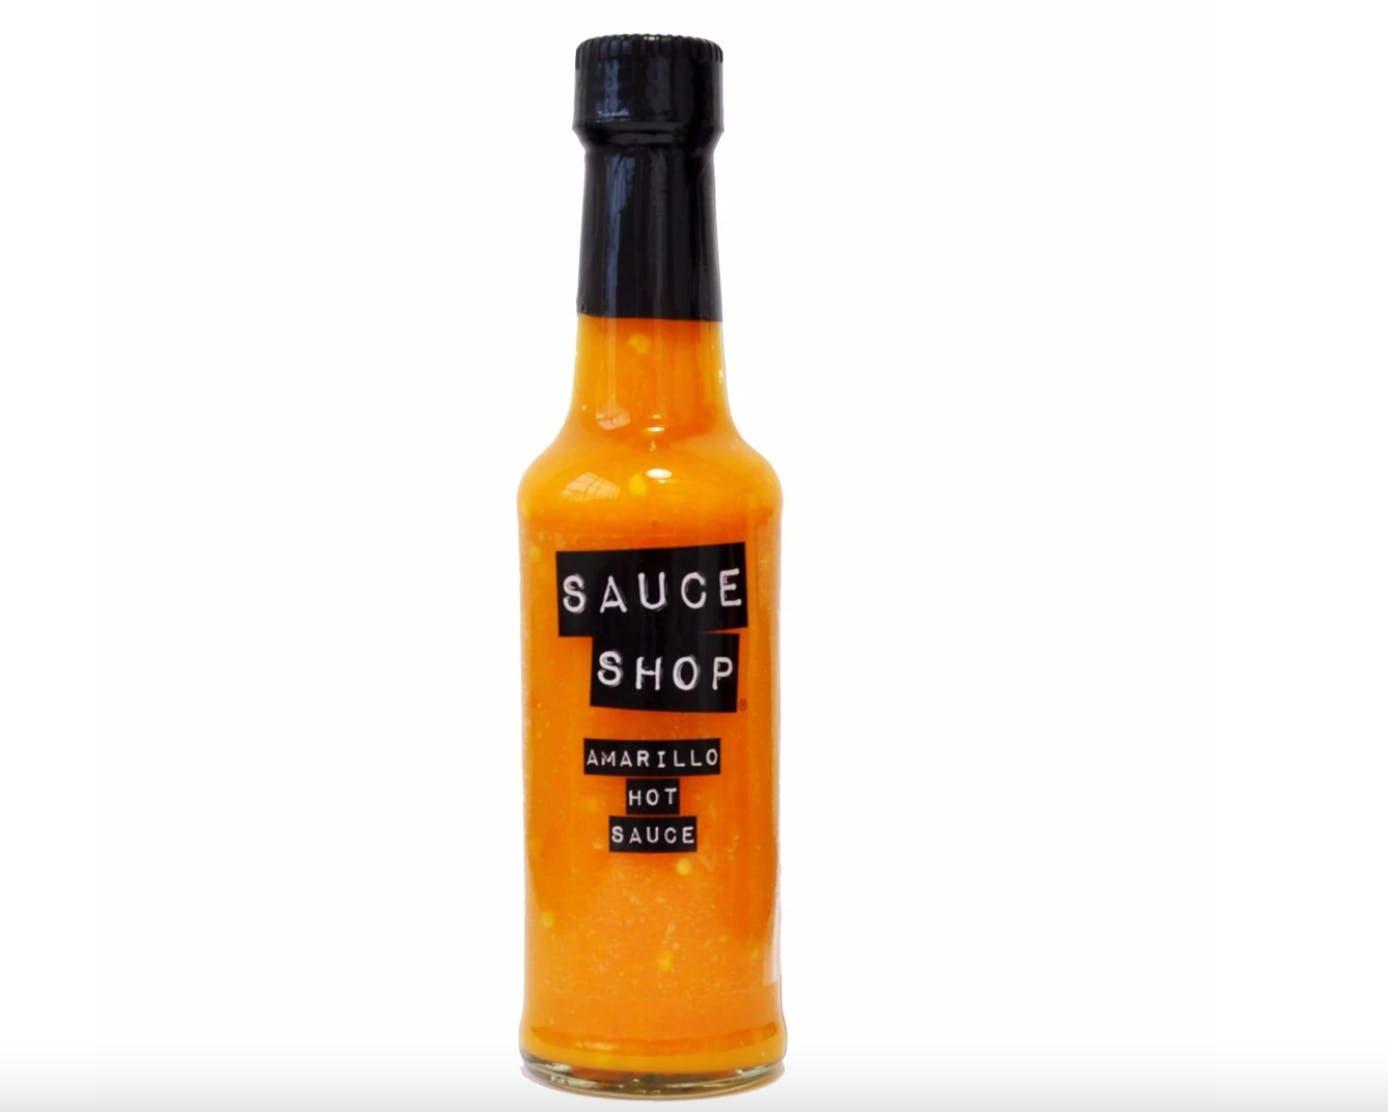 a bottle of hot sauce